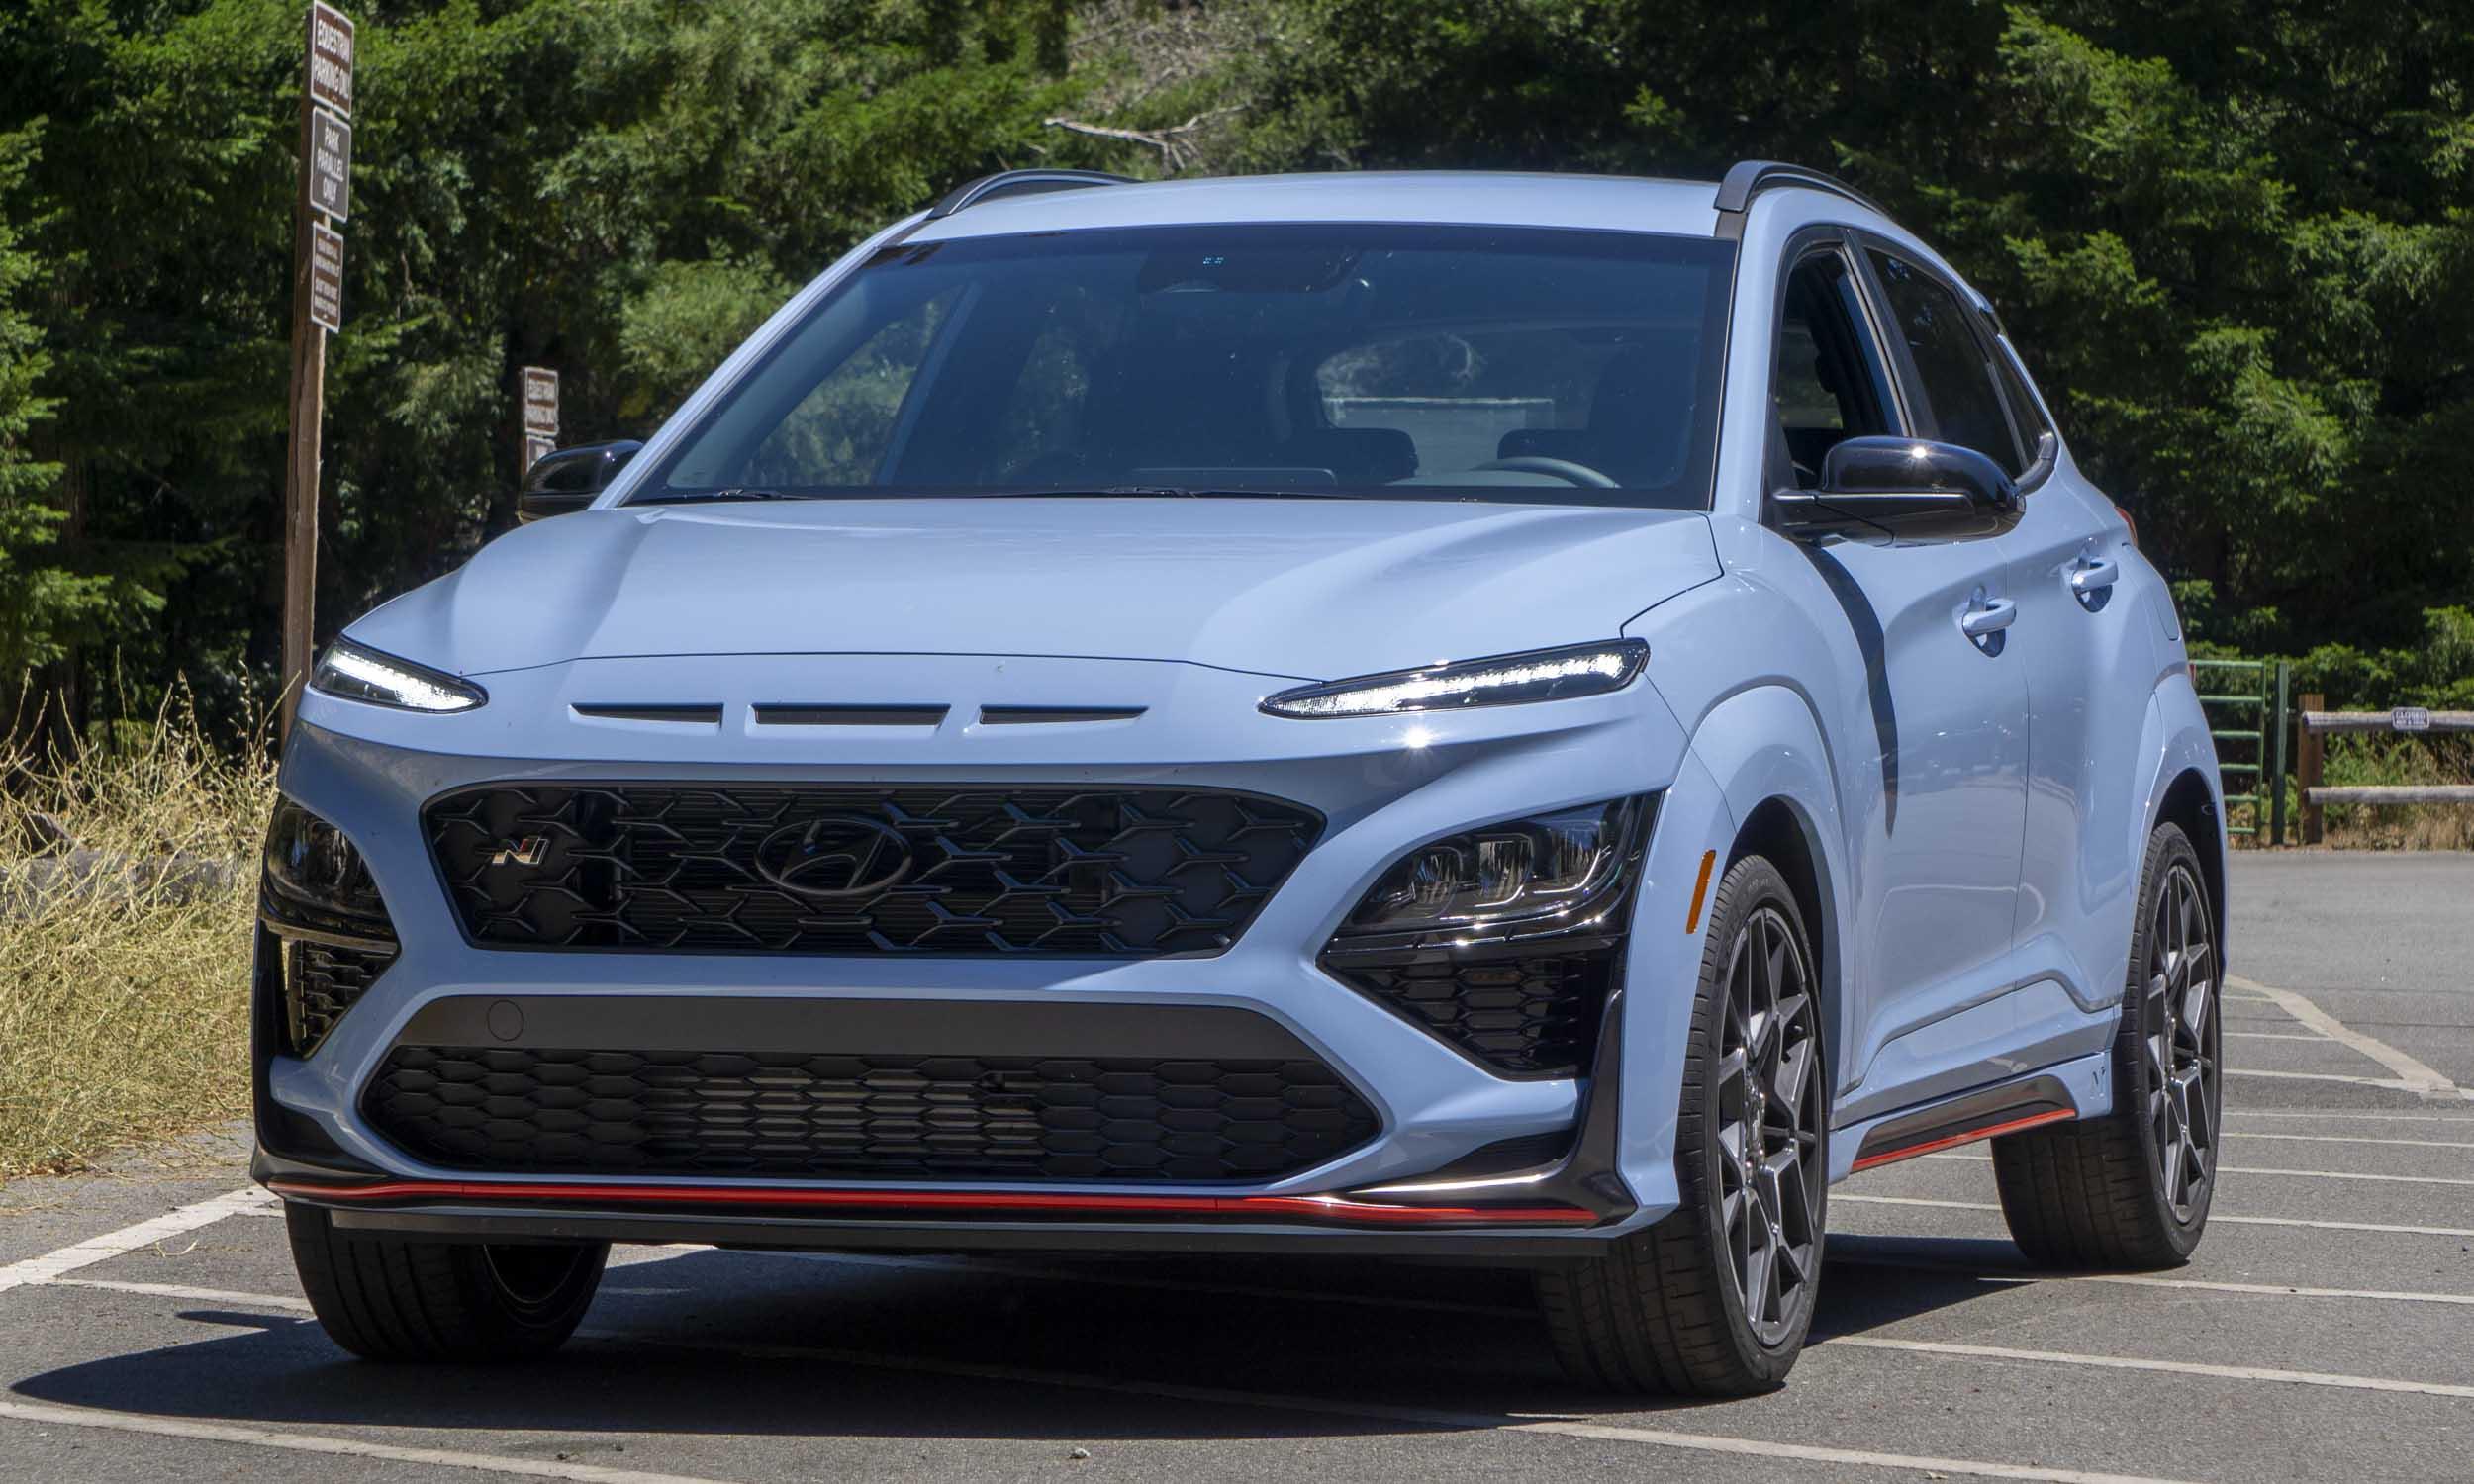 hyundai makes the 2021 kona electric in three trim levels: 2022 Hyundai Kona N First Drive Review Autonxt